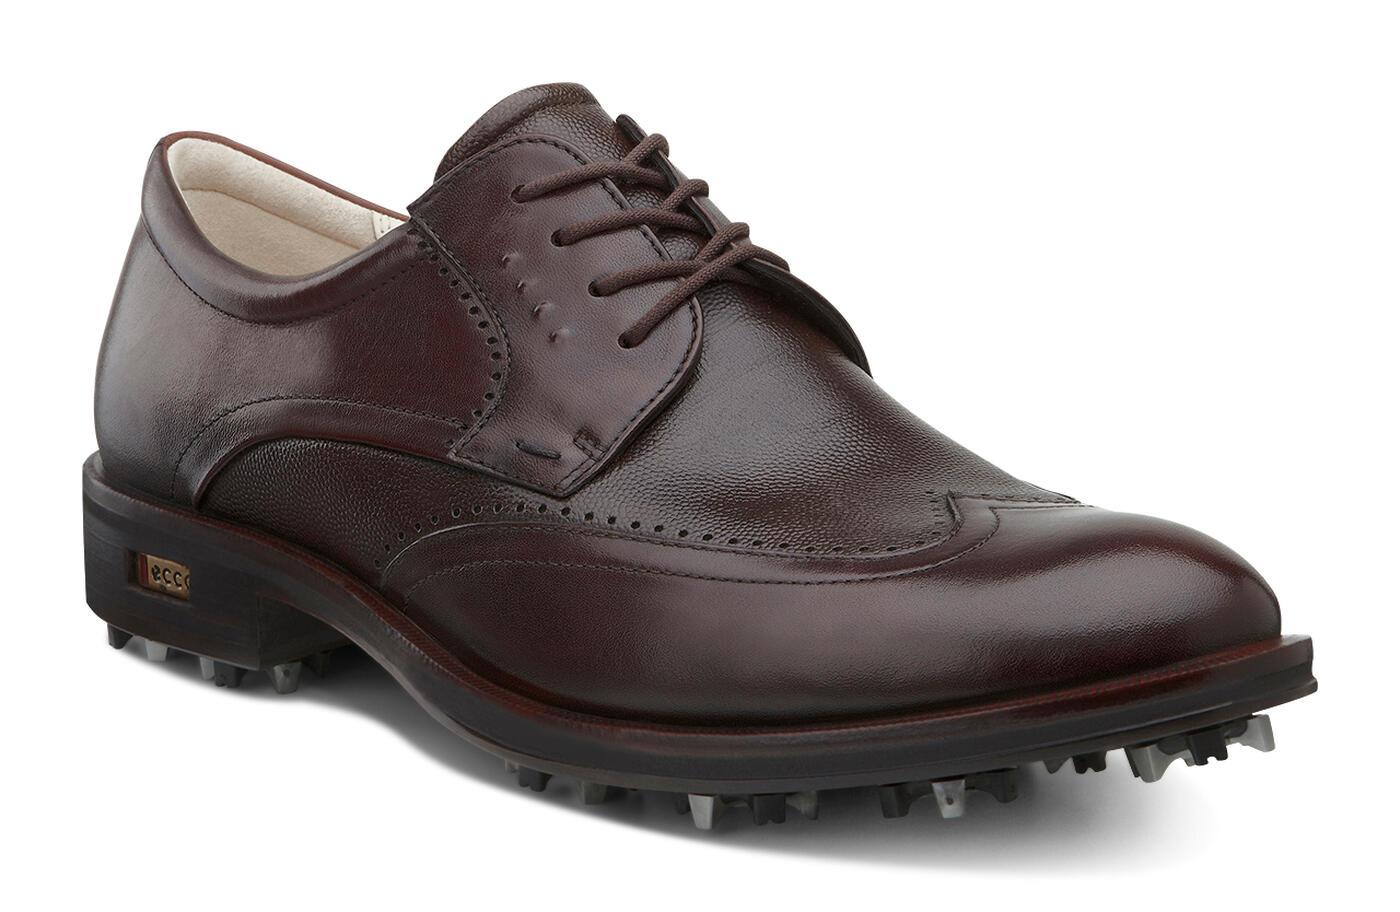 ECCO New World Class Men's Golf Shoe